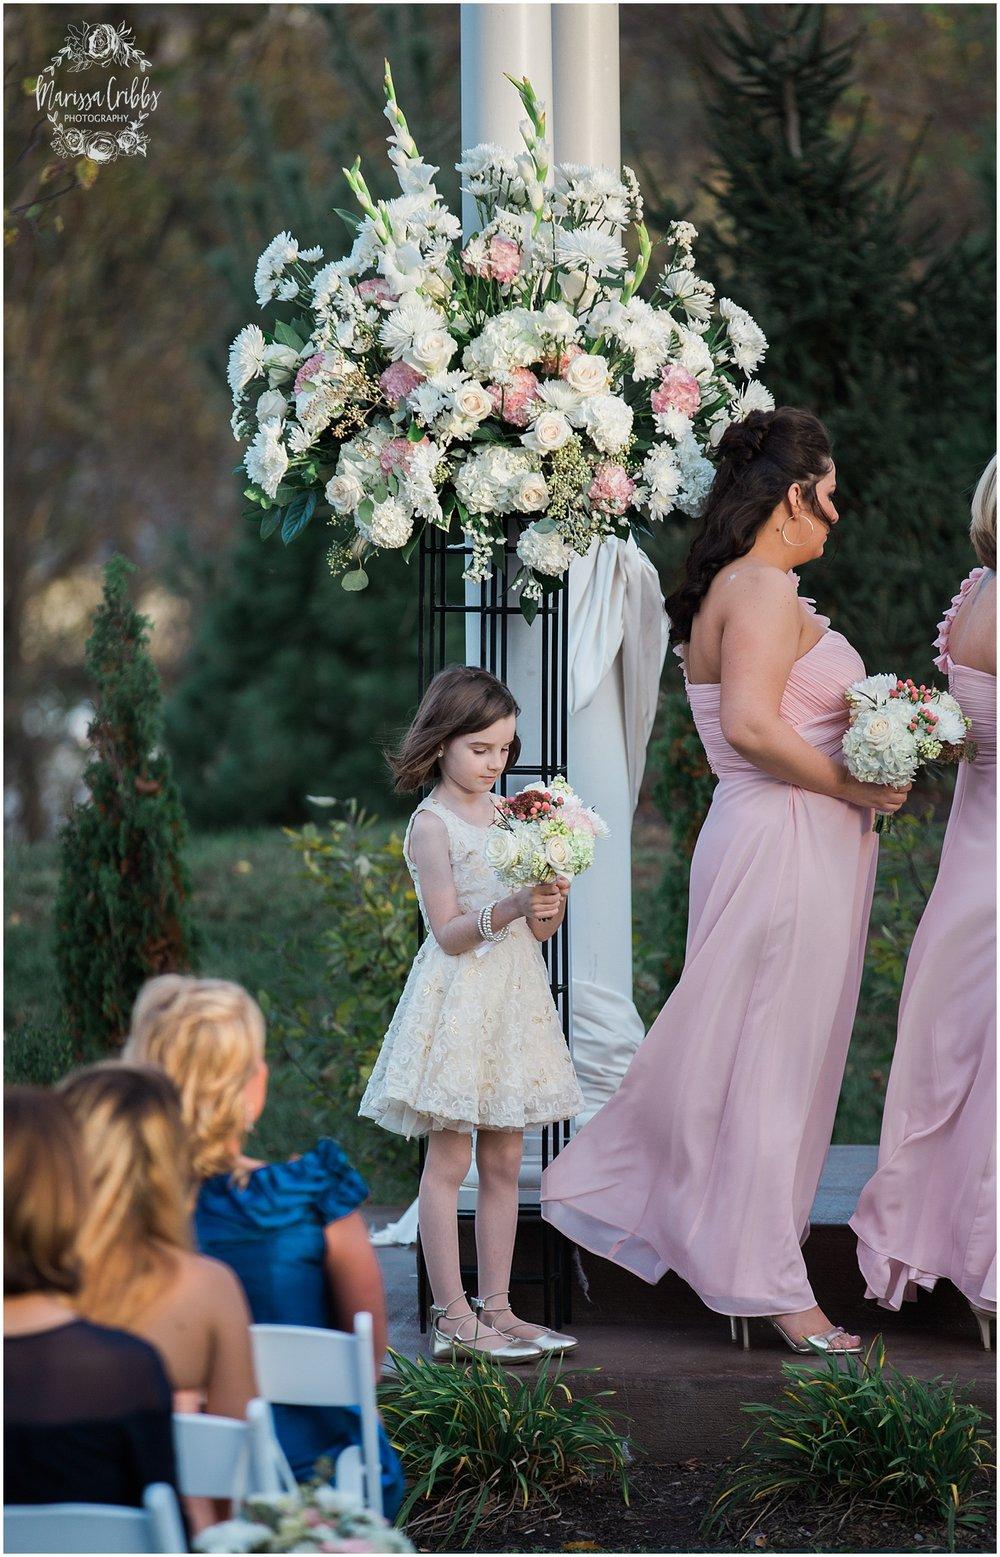 Alex & Amie | Eighteen Ninety Event Space | Marissa Cribbs Photography | Kansas City Perfect Wedding Guide_1344.jpg